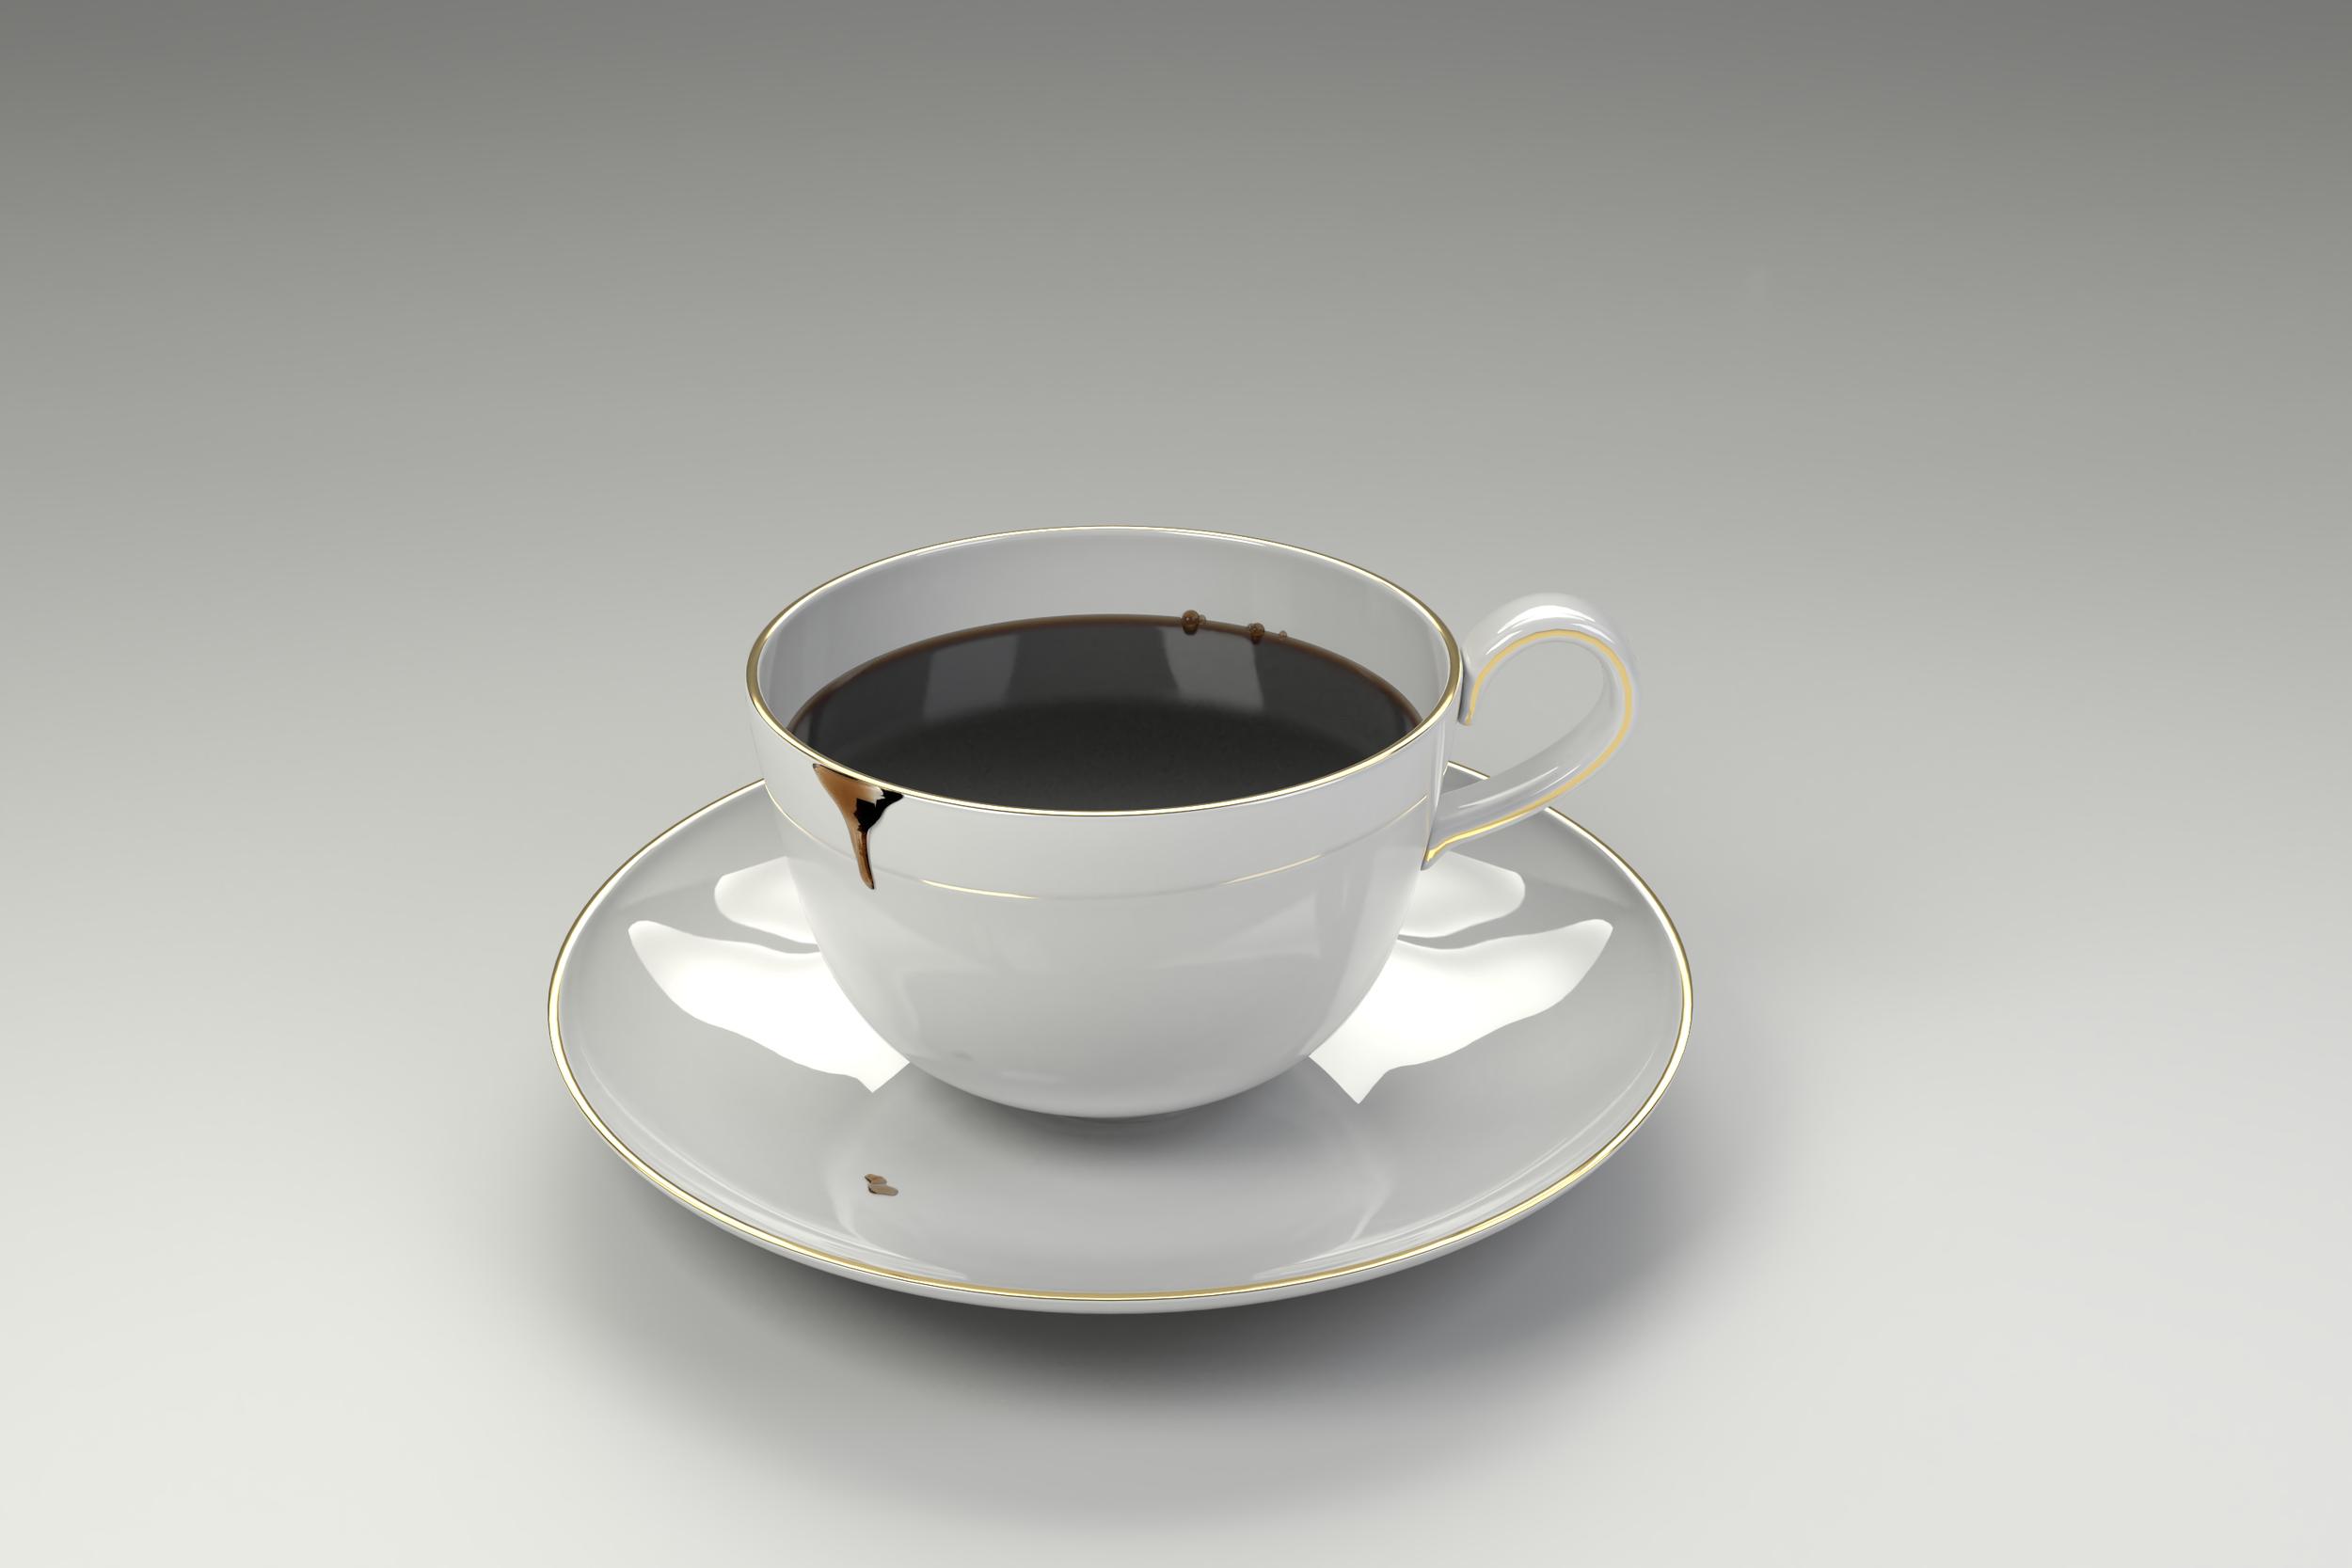 2018-03-16_kaffee.png